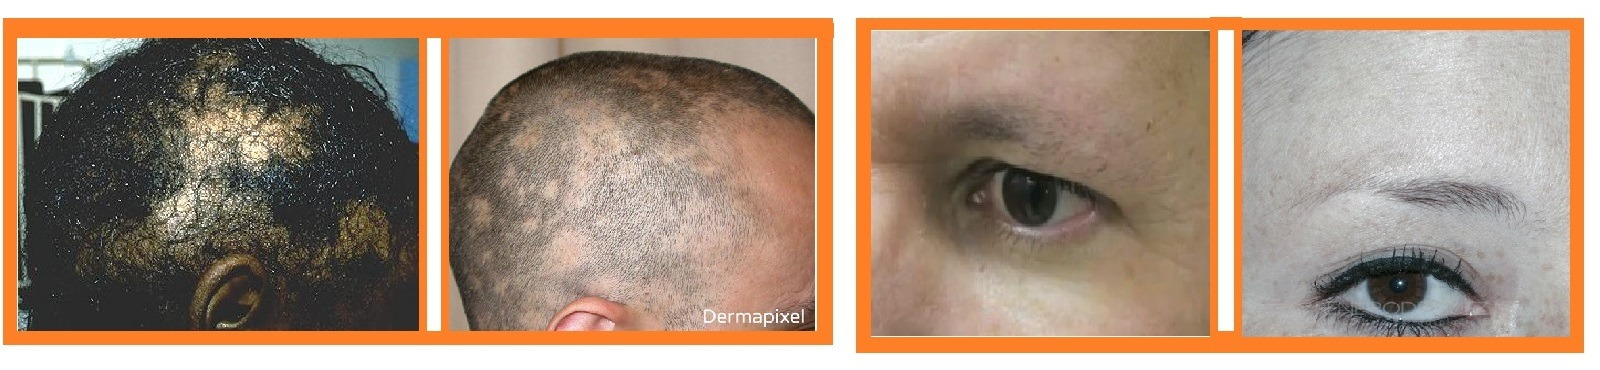 Sífilis-Sintomas - Alopecia sifilítica - Sífilis secundária